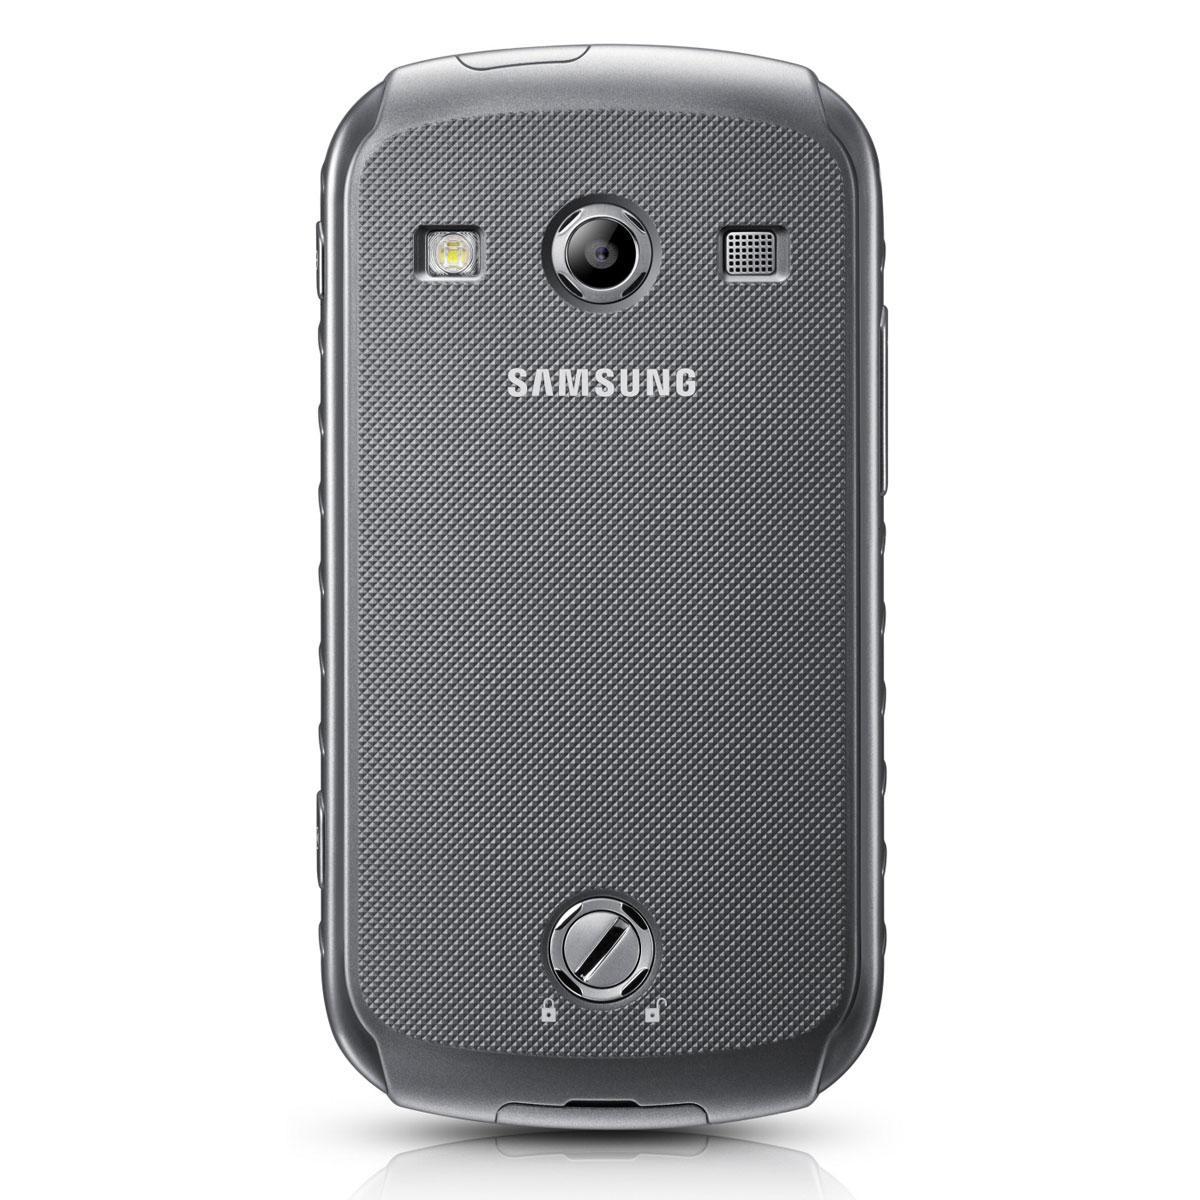 Samsung Galaxy Xcover 2 GT-S7710